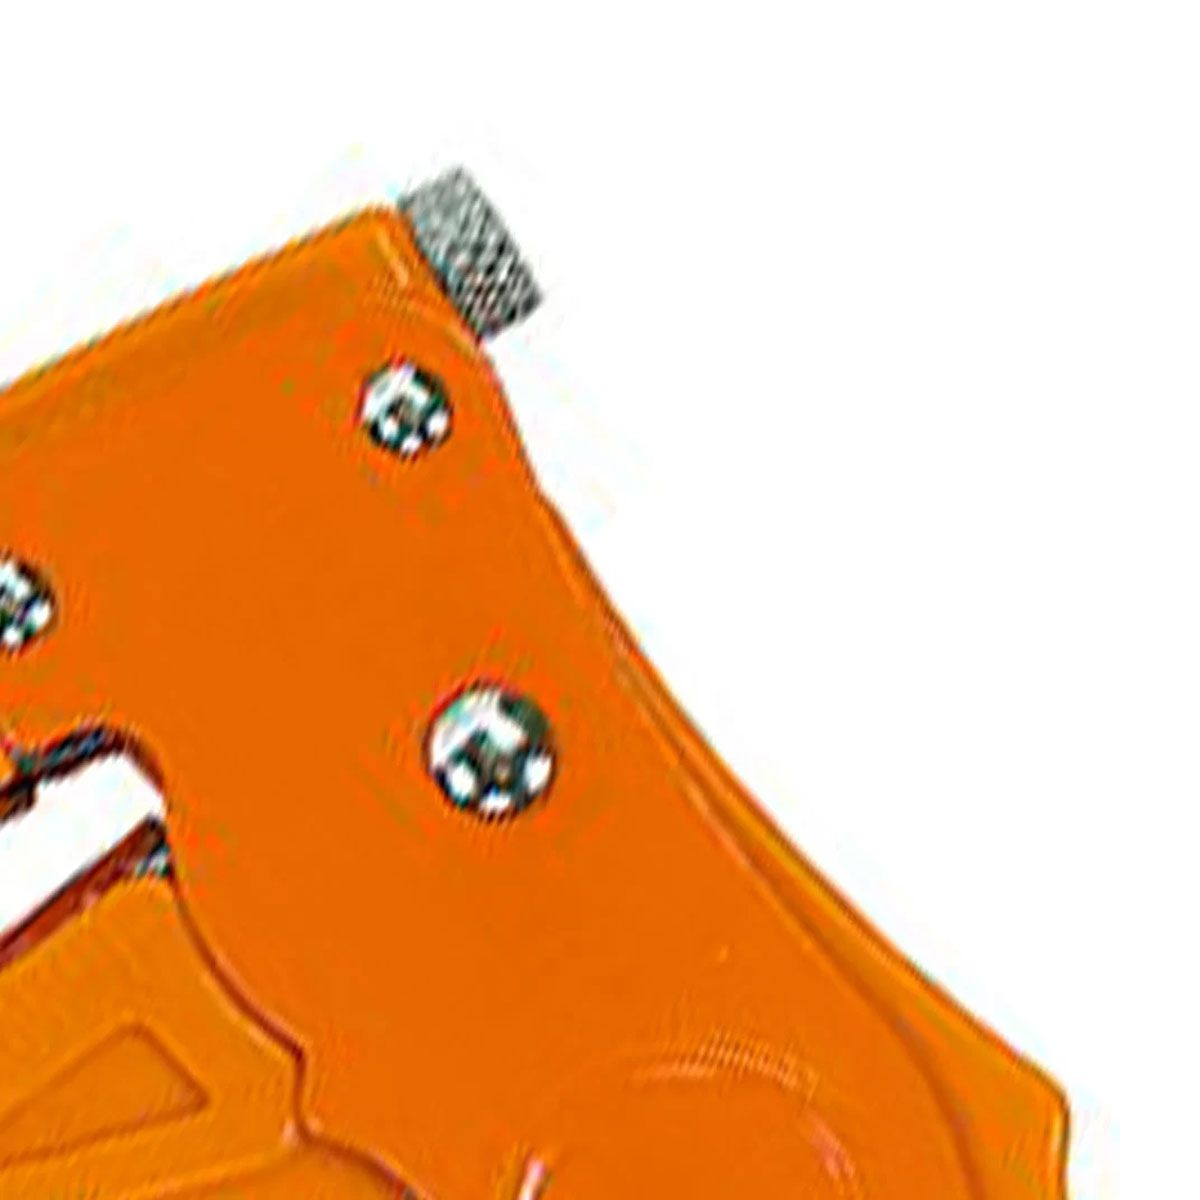 Alicate Decapador / Desencapador / Cortador de Fios 0,2 a 6mm² HK-310 - Hikari